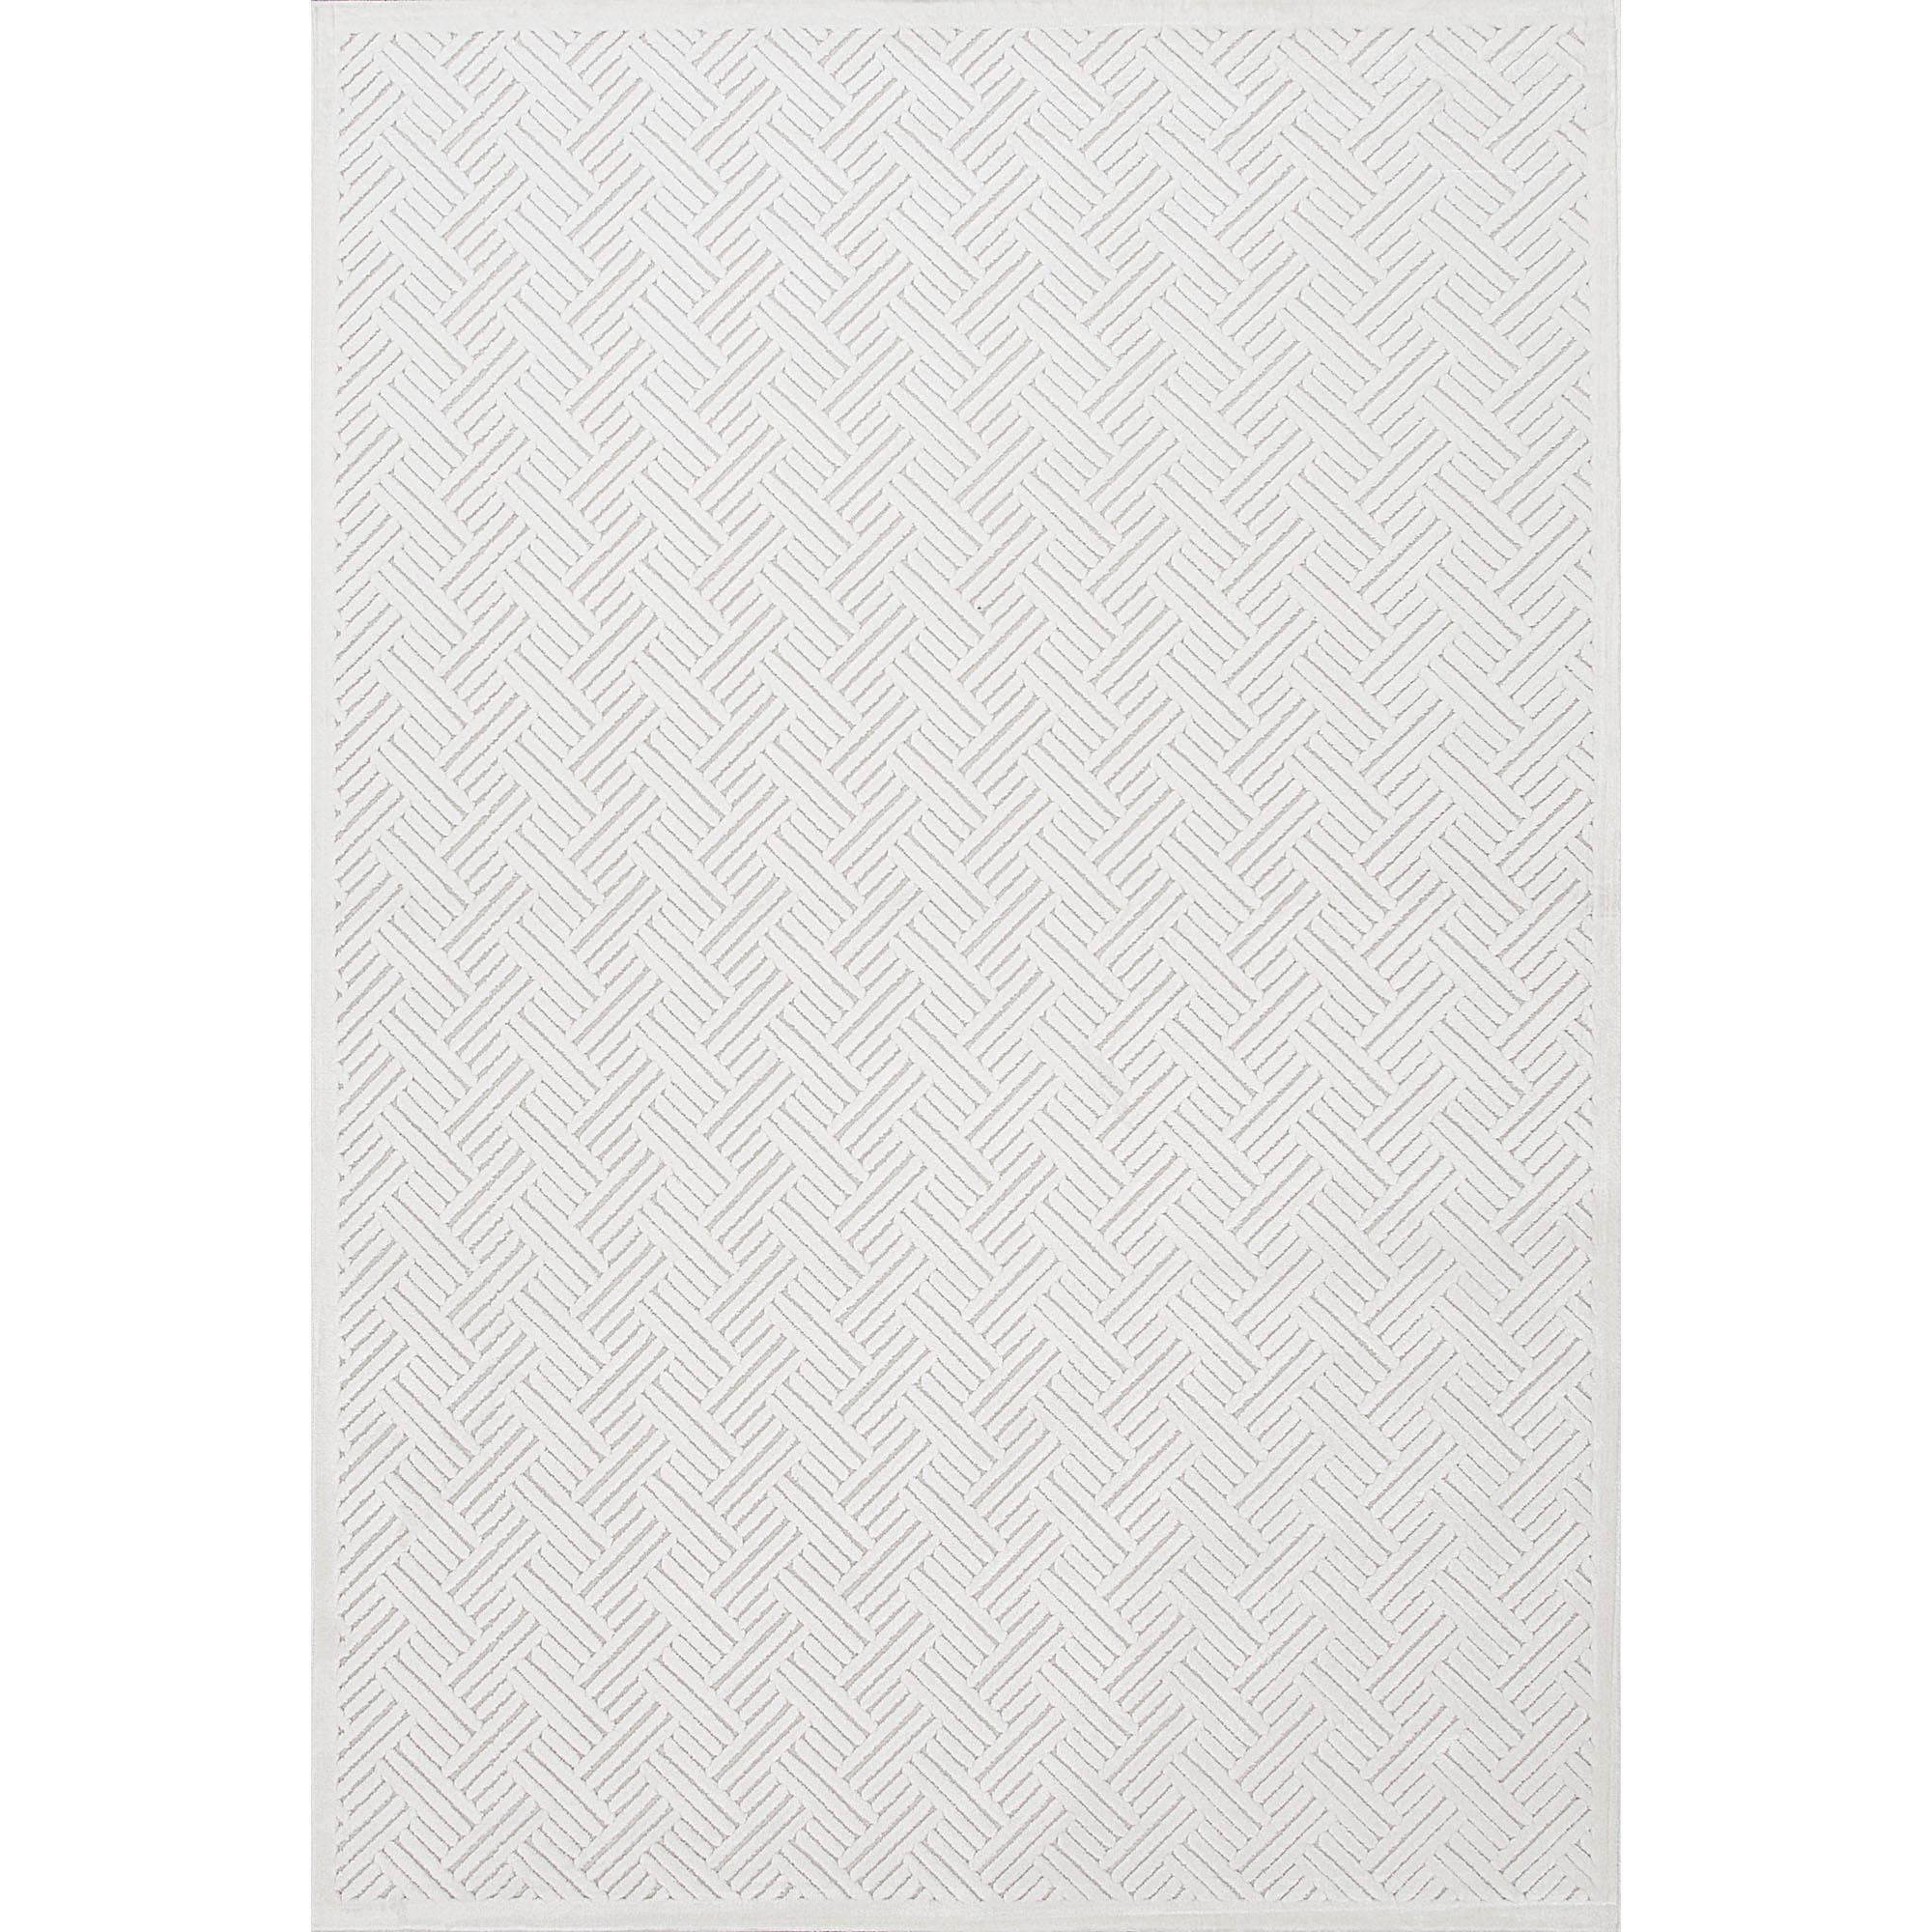 JAIPUR Rugs Fables 2 x 3 Rug - Item Number: RUG111902